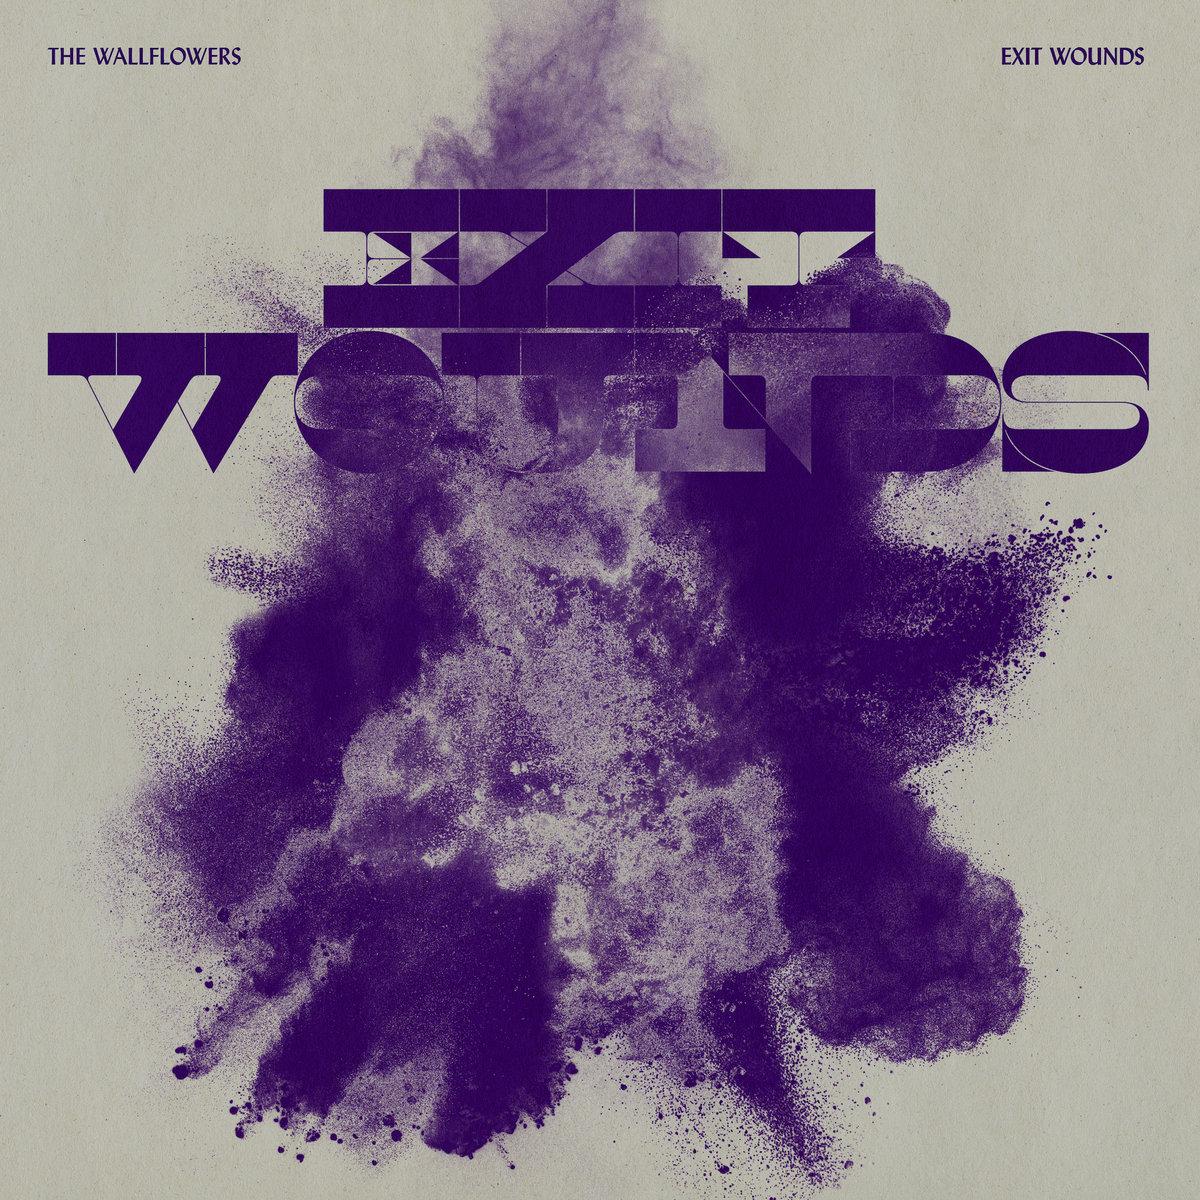 Wallflowers - Exit Wounds [LTD LP] (Scando Excl. Splatter)